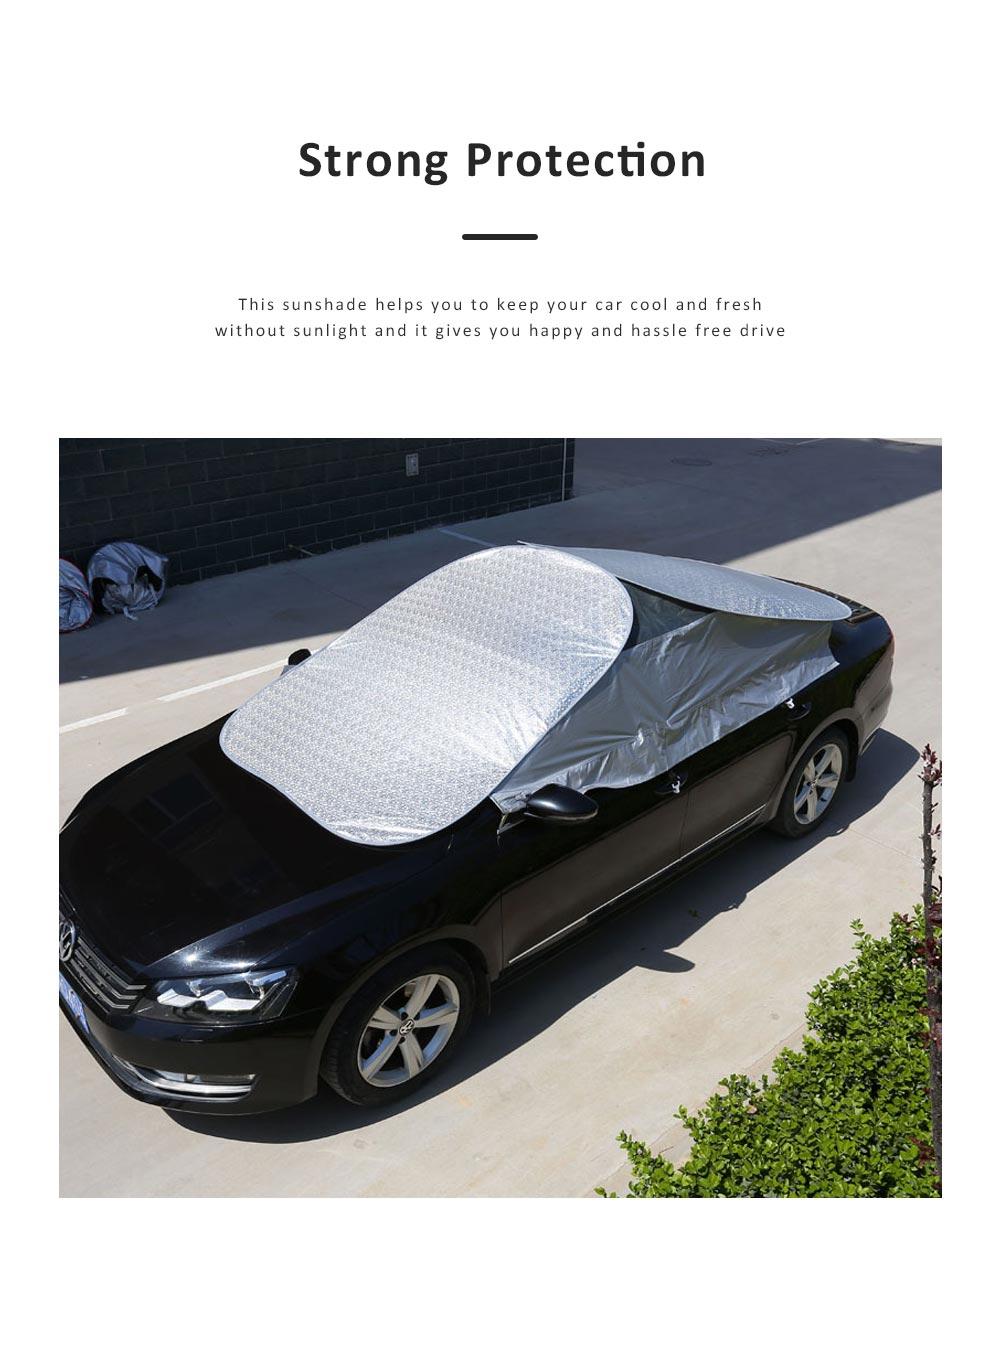 Universal Car Sunshade UV Ray Protector Cooler Umbrella Fabric Sunshade for Cars 1